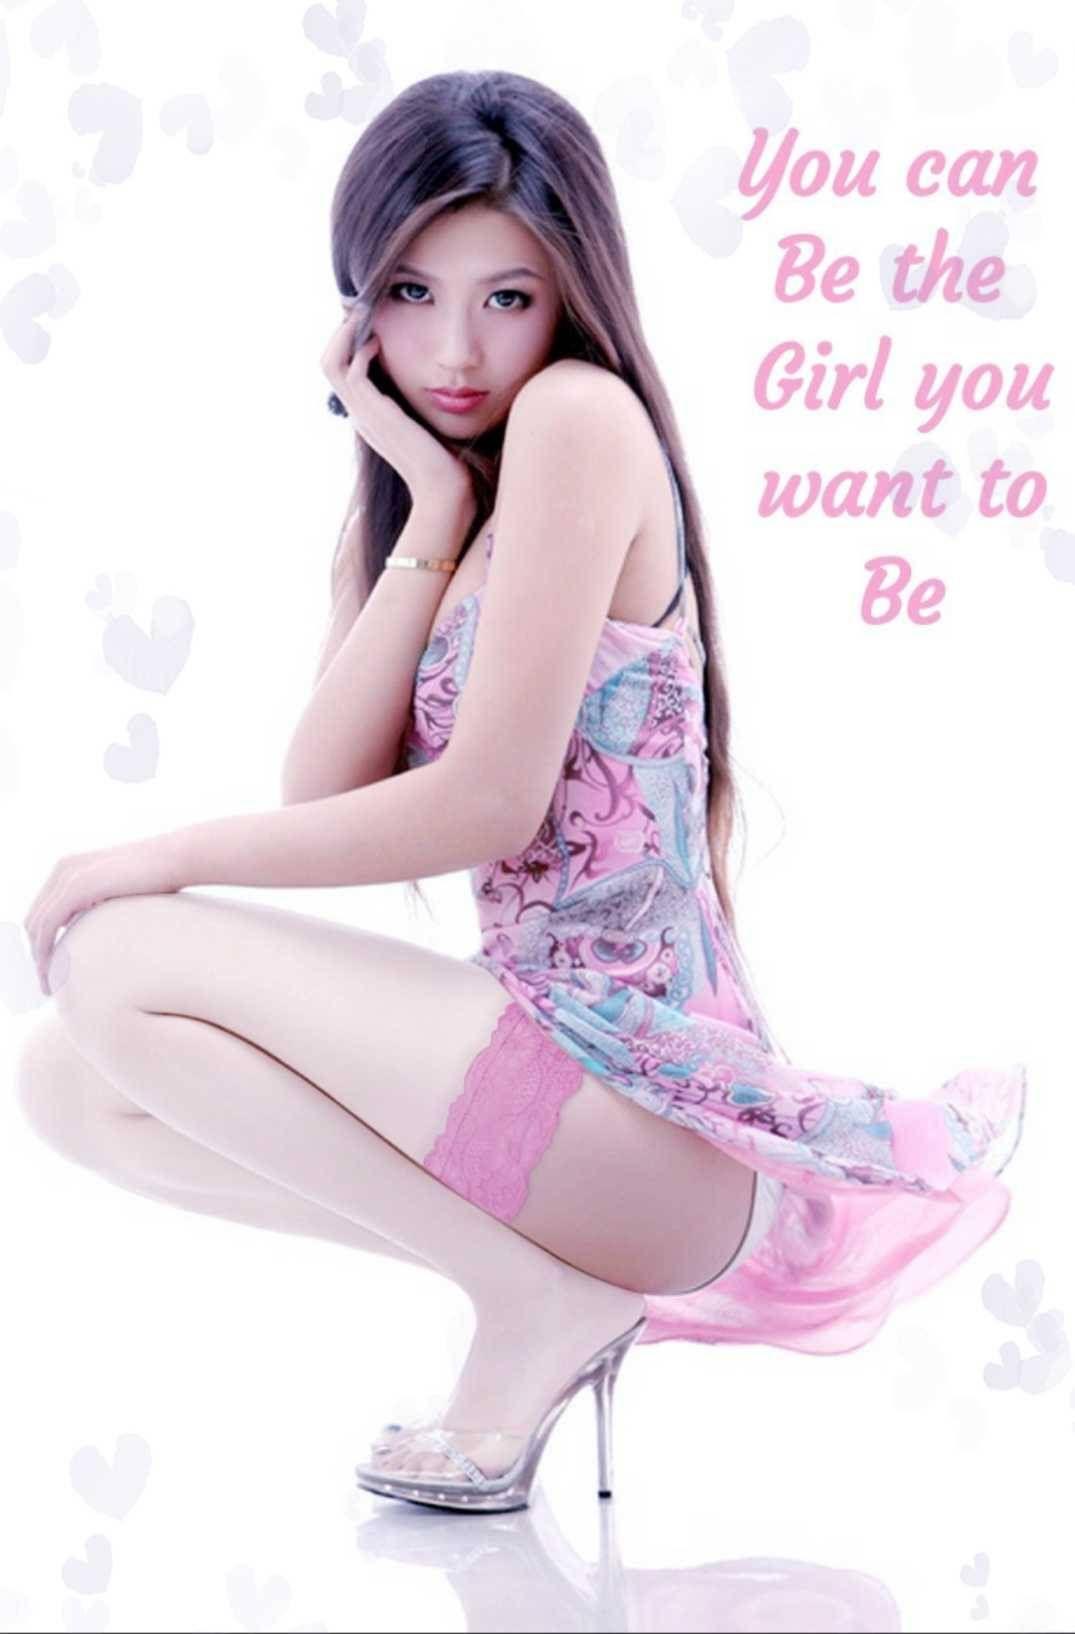 Louiselonging Girly Captions Tg Captions Girly Girls Yes Please Submissive Transgender